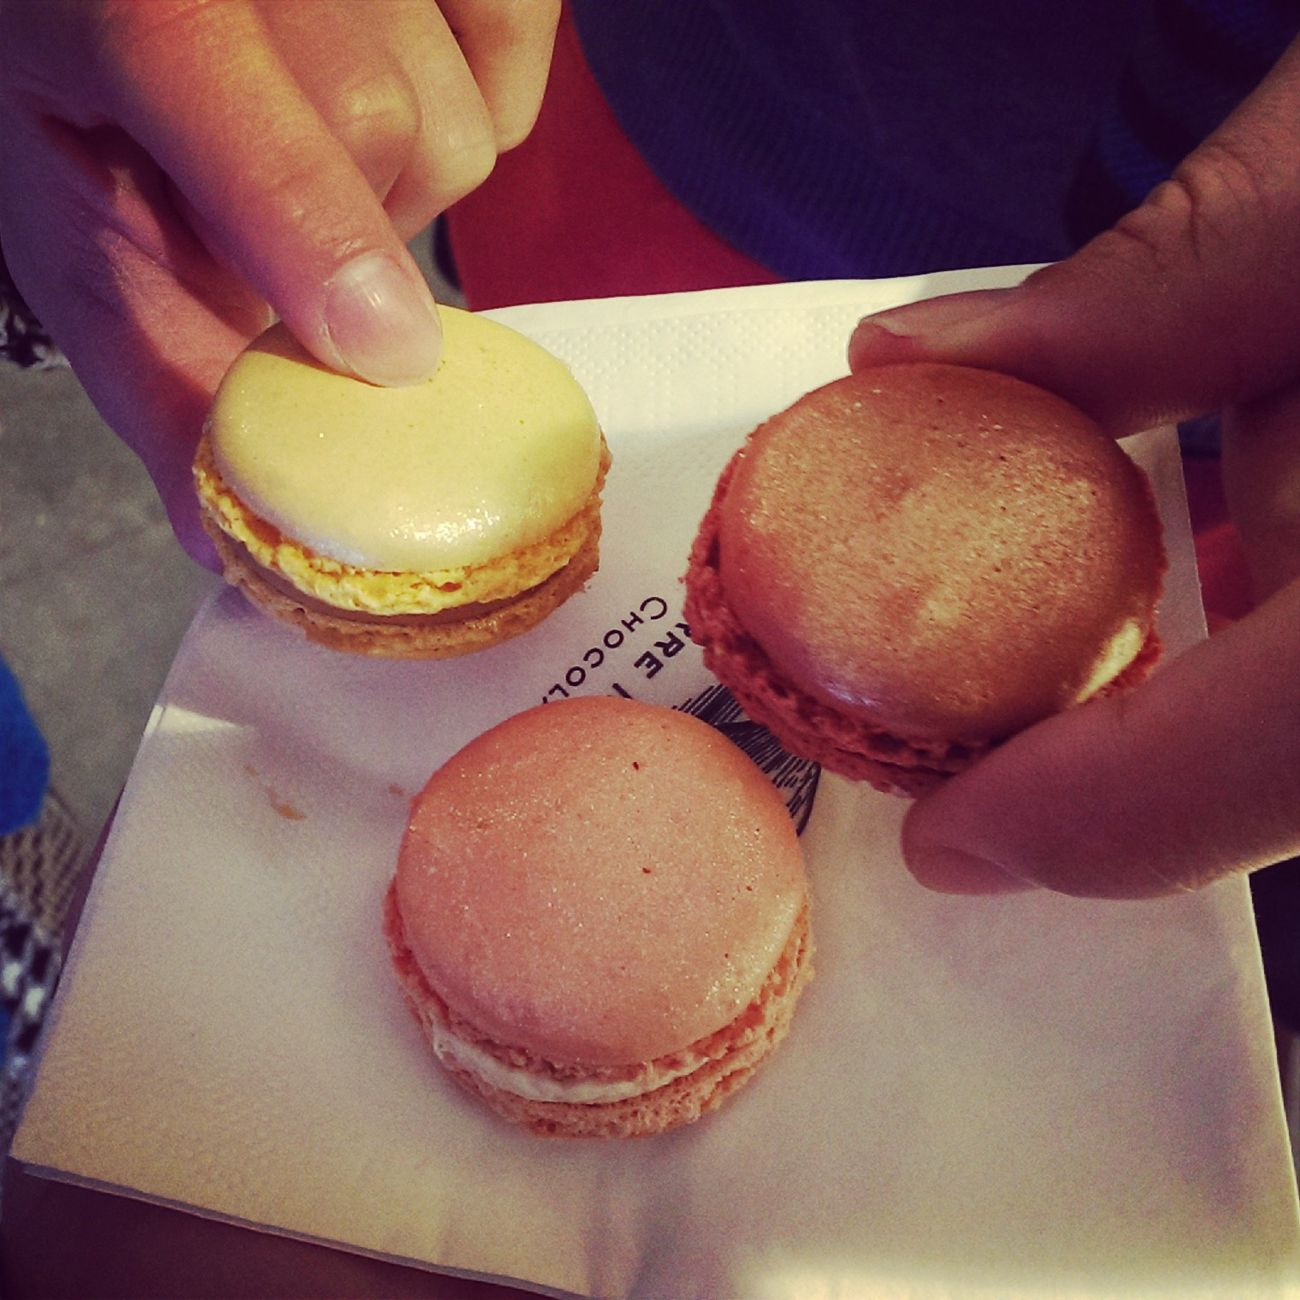 Macarons Yummy Sweets #food #love Ee_daily